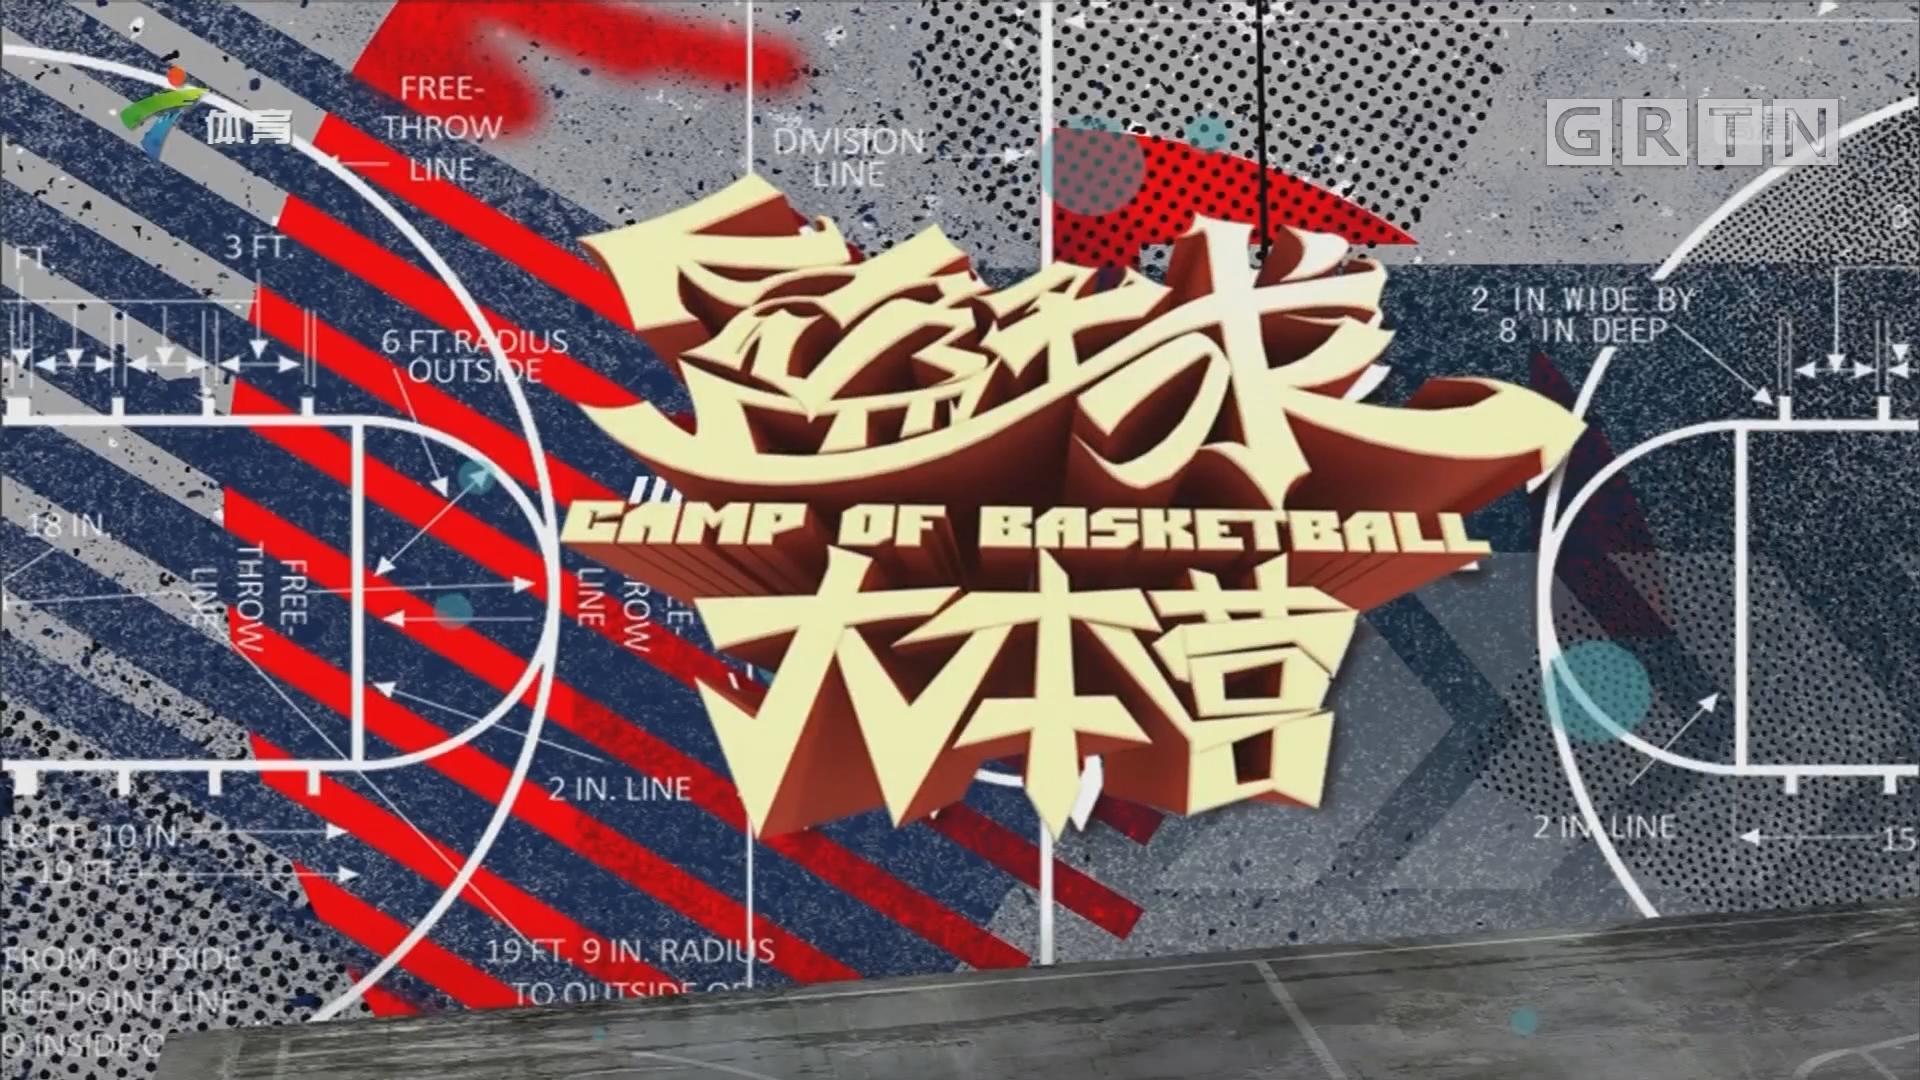 [HD][2019-04-04]篮球大本营:深圳创造奇迹 与广东会师半决赛